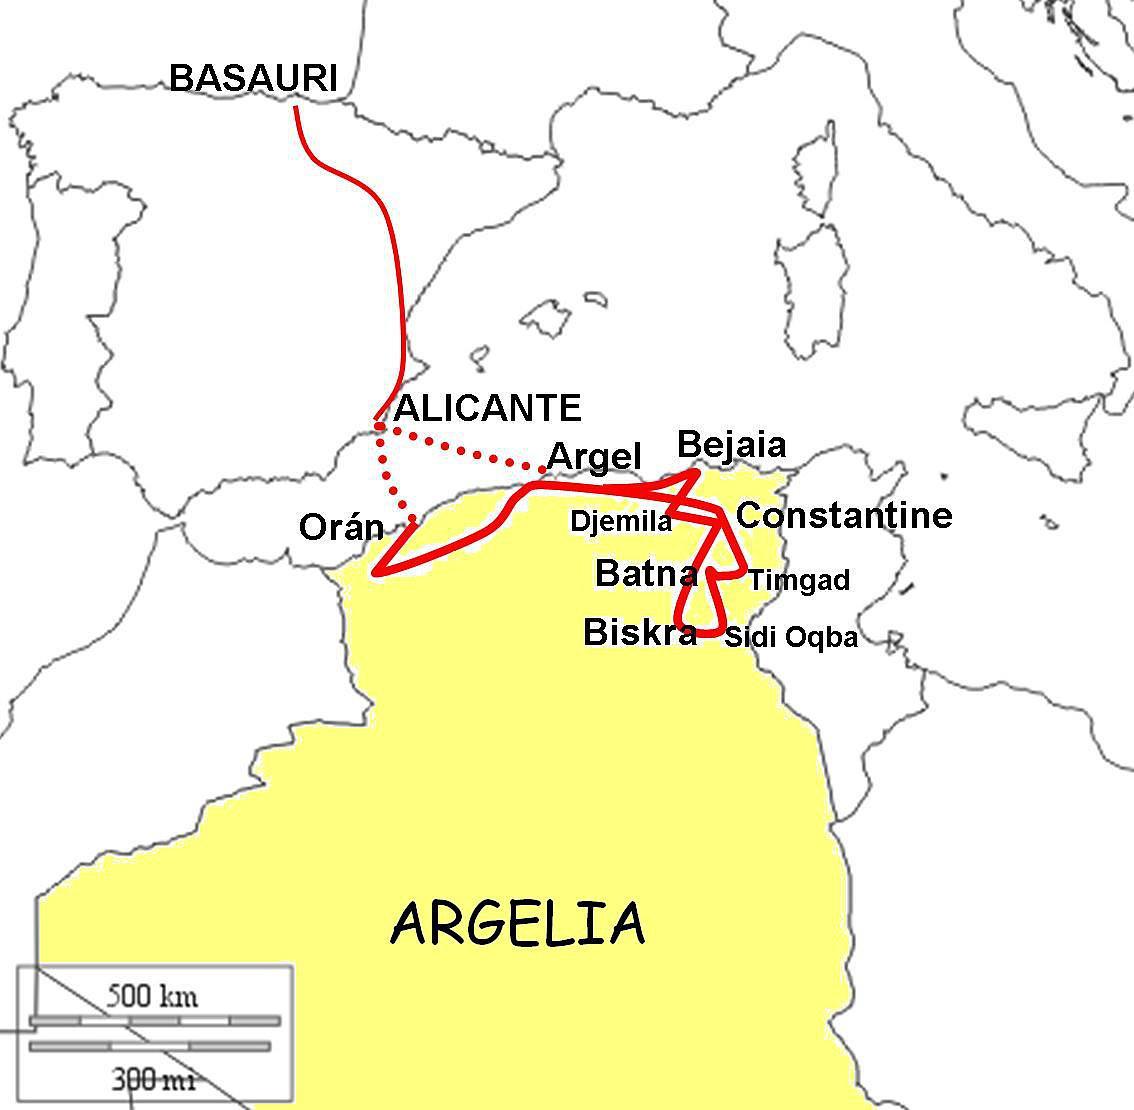 Nord-Algerien ohne Guide bereisen